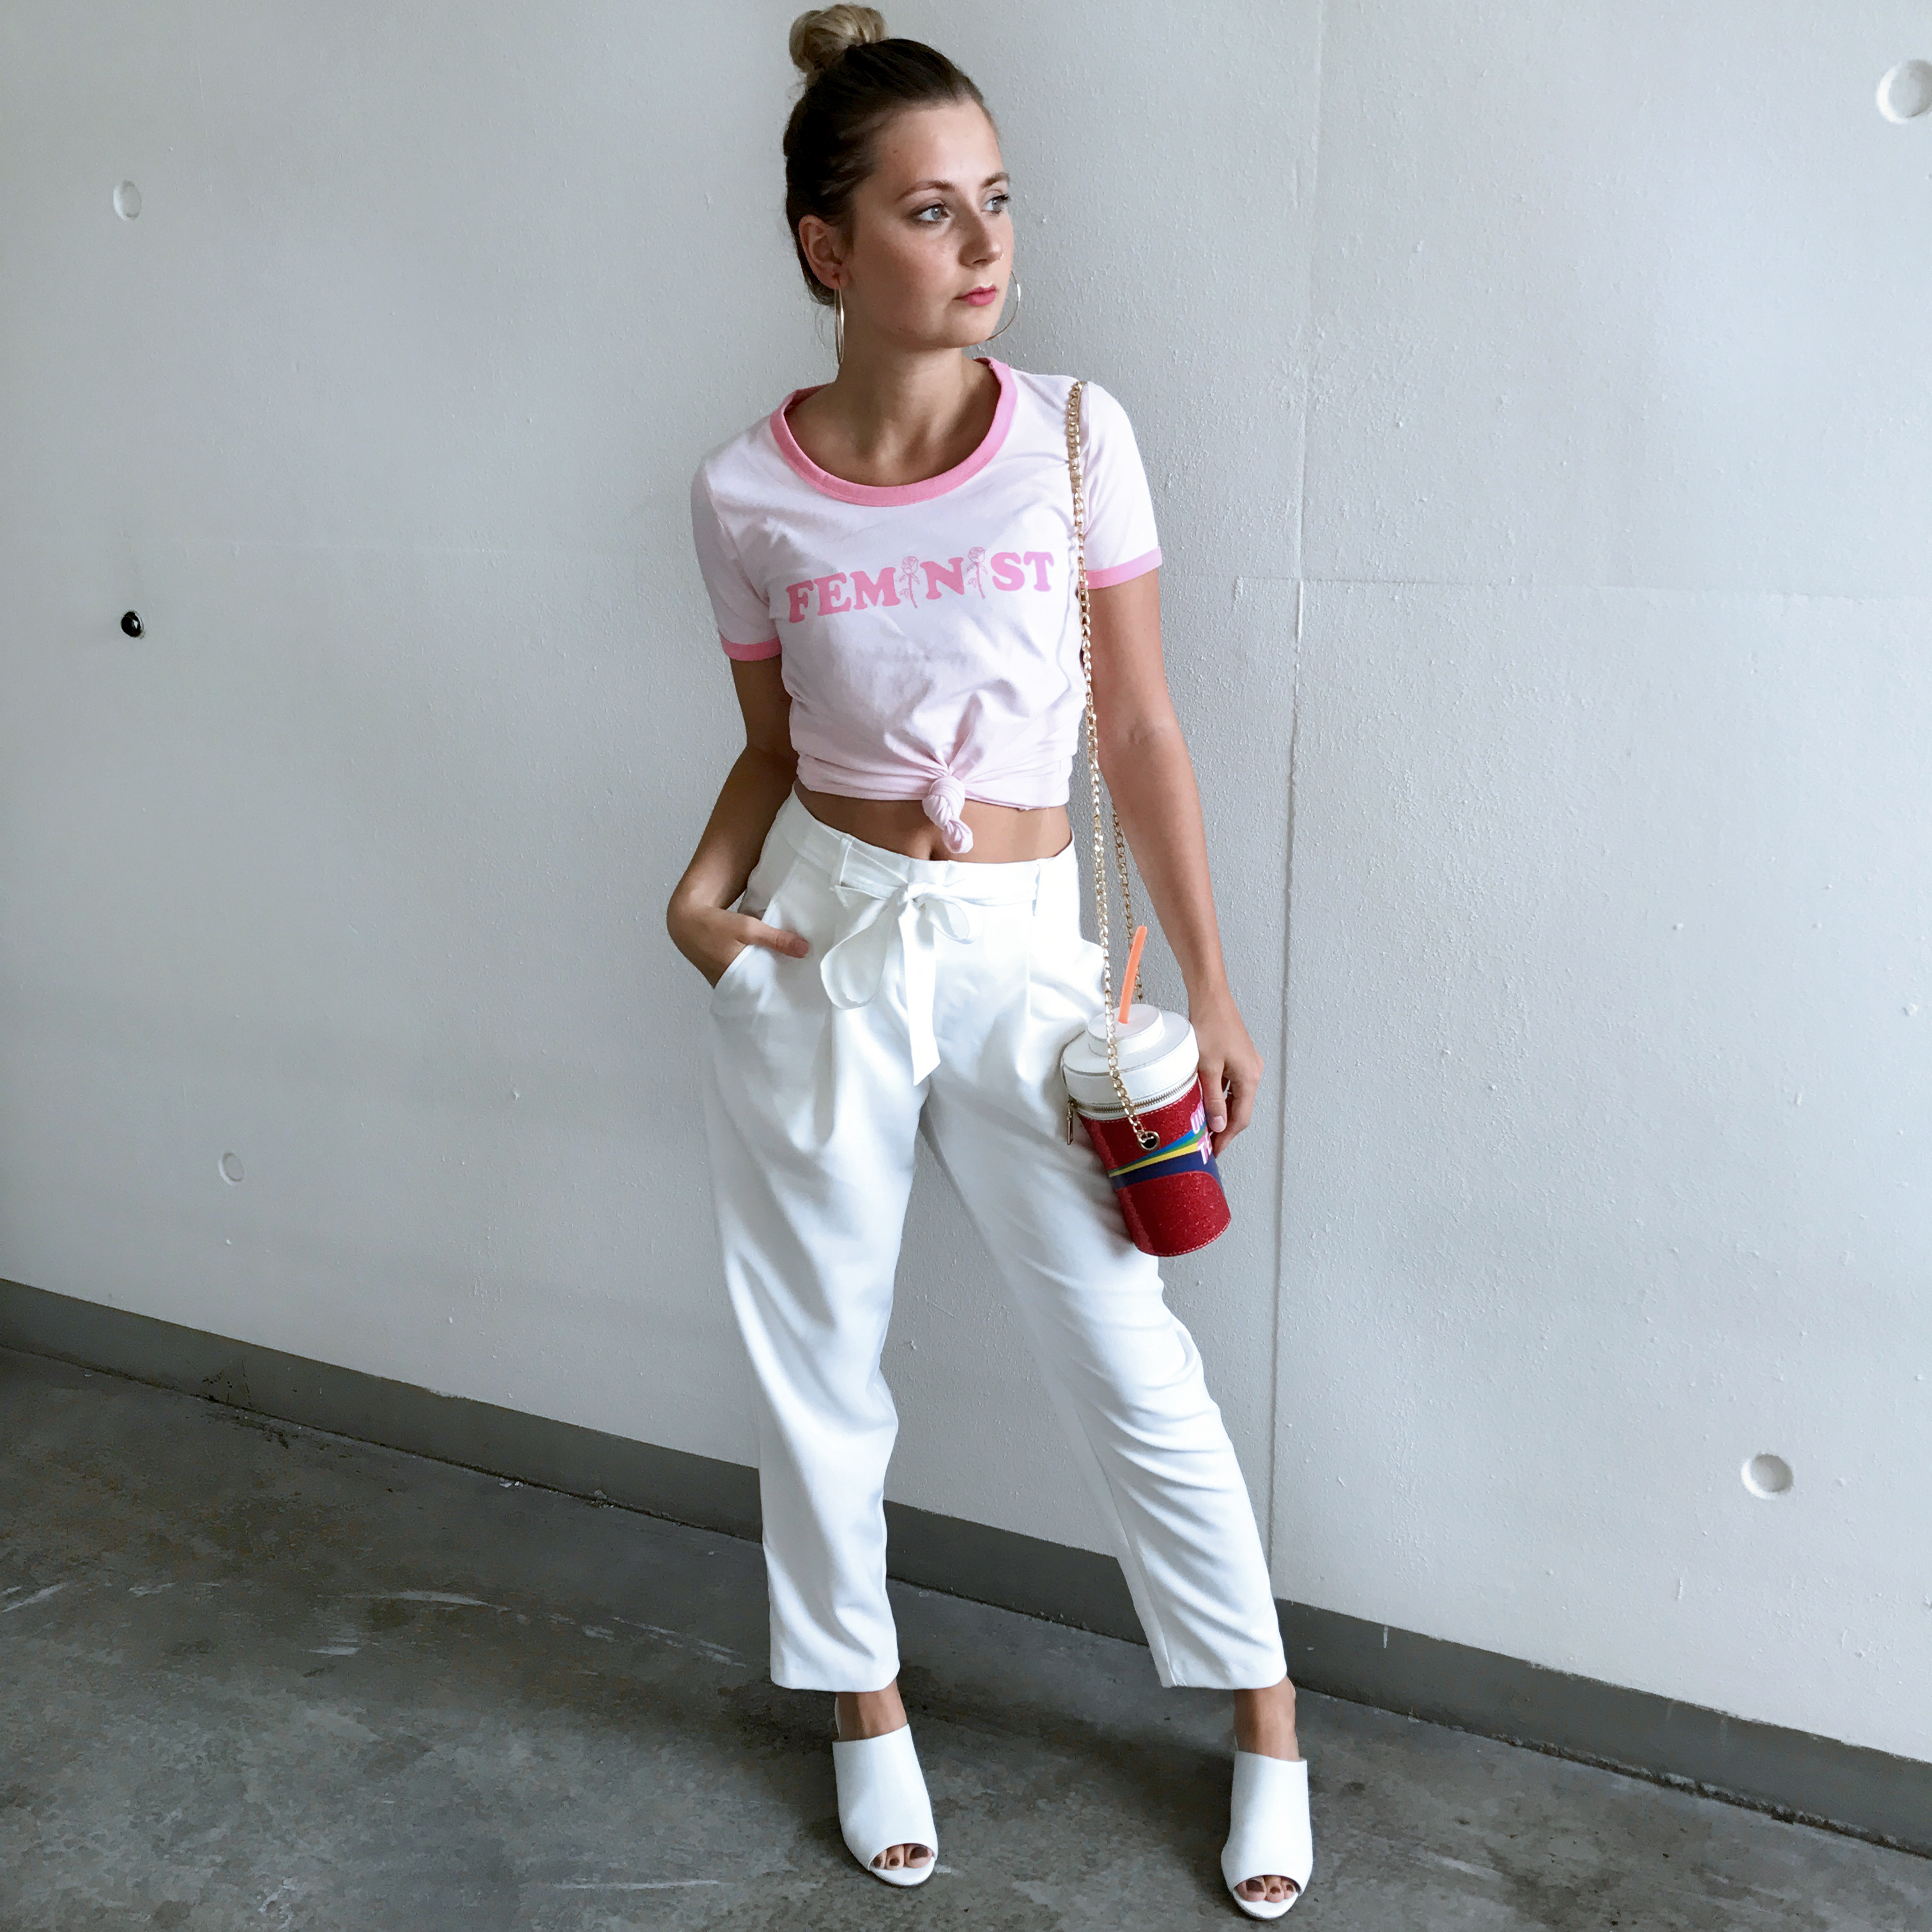 feminist-new-look-mules-bindehose-style-comfy-stylish-modeblogger-fashionblogger